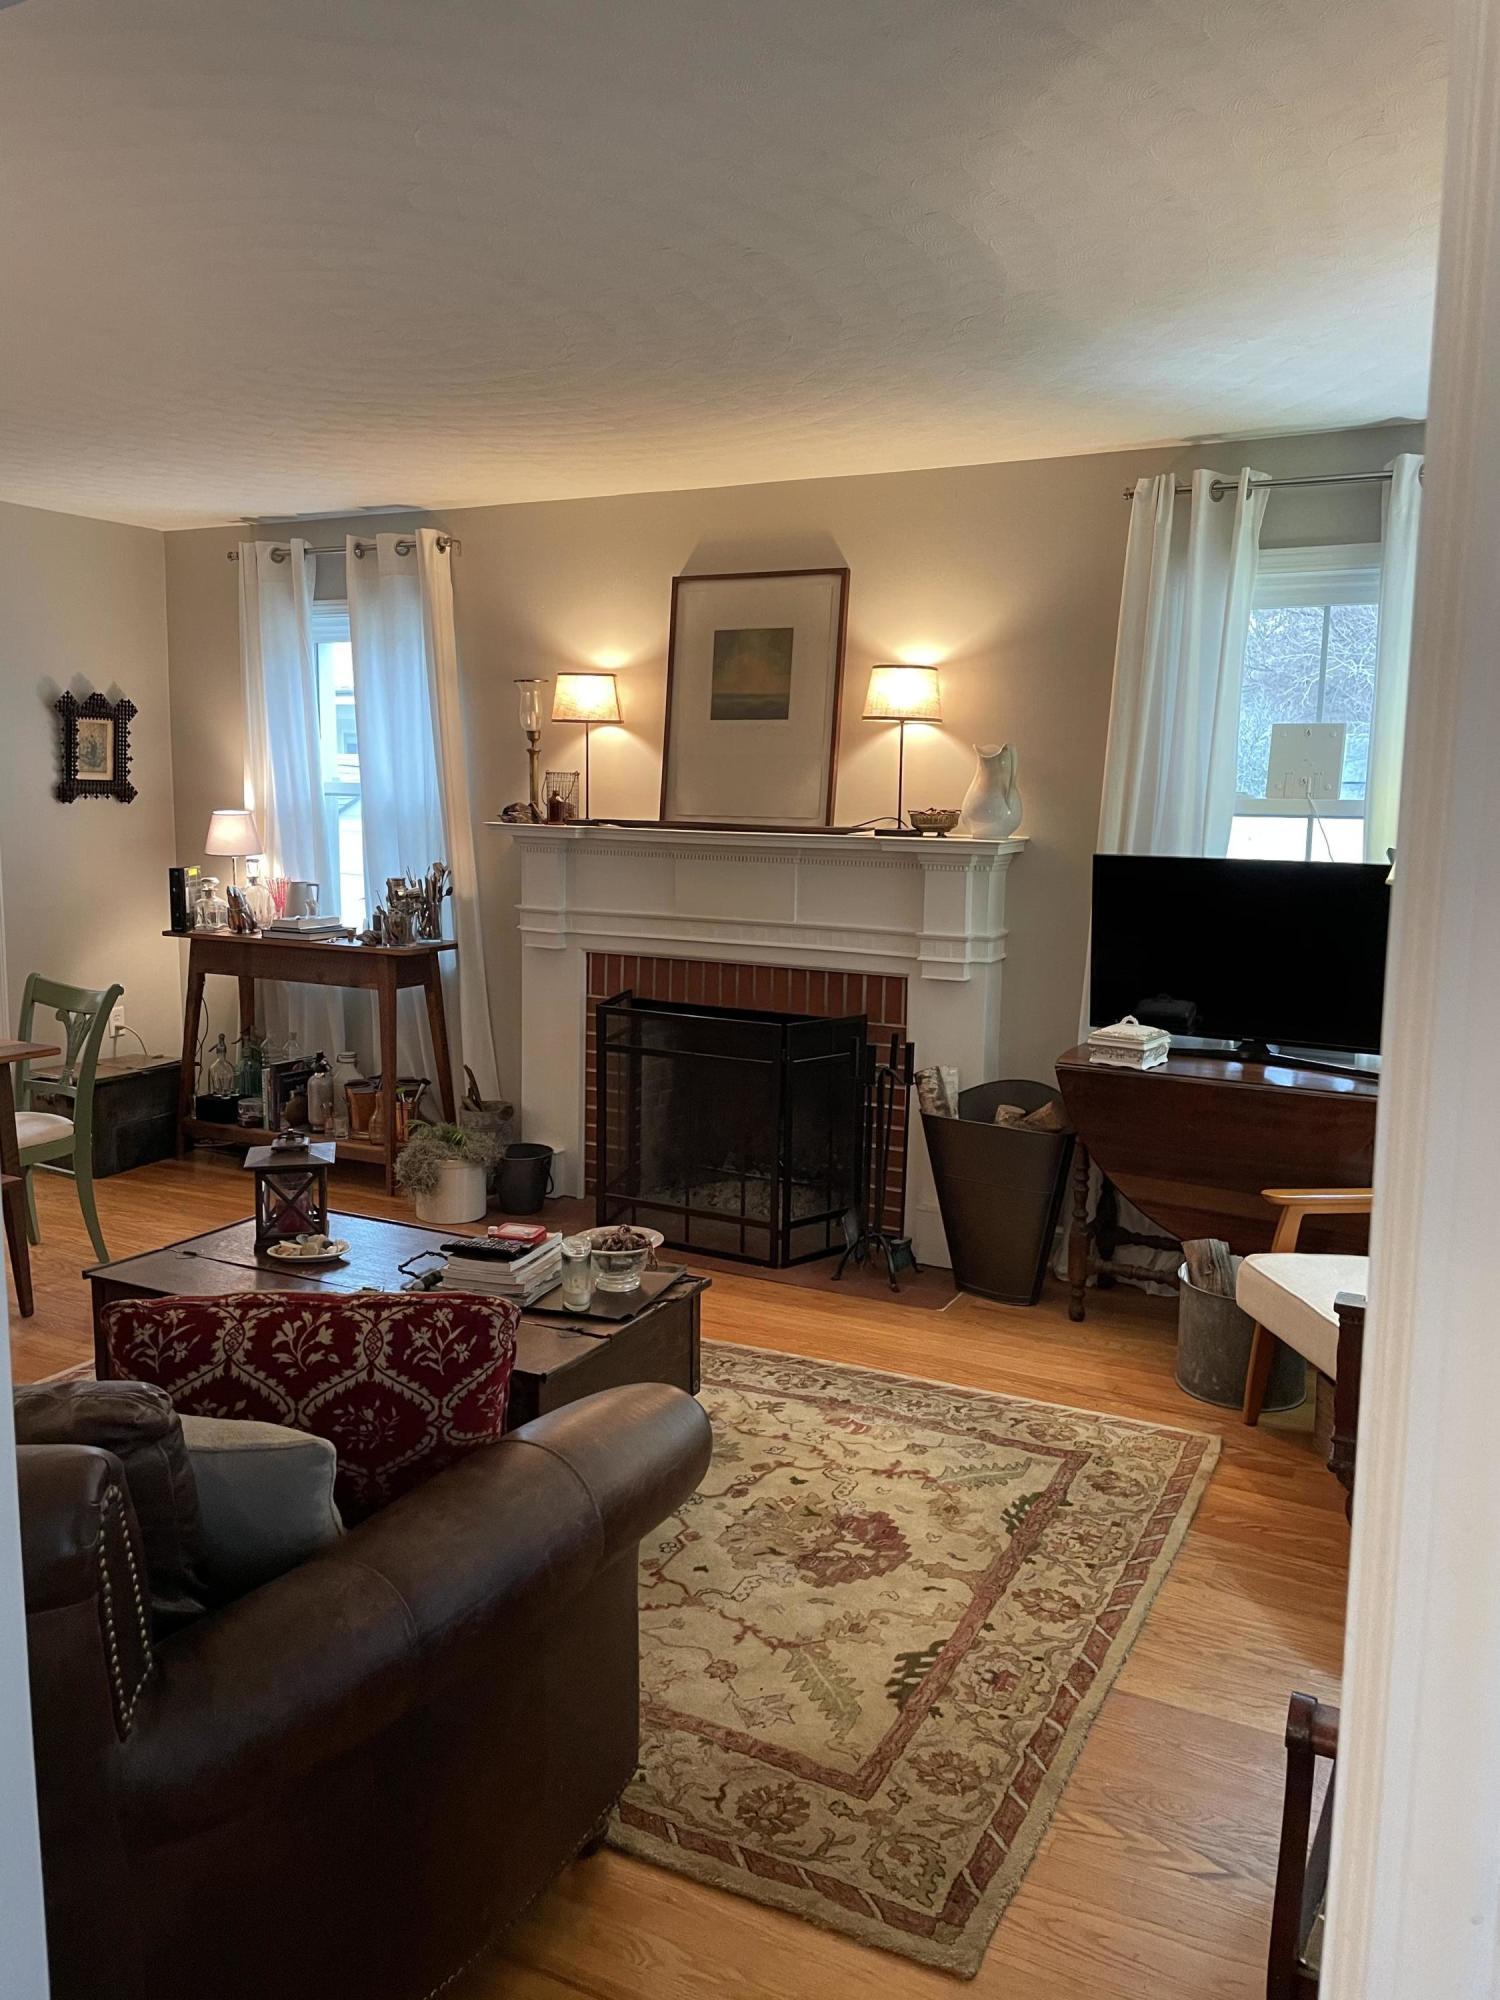 Old Mt Pleasant Homes For Sale - 542 Center, Mount Pleasant, SC - 15